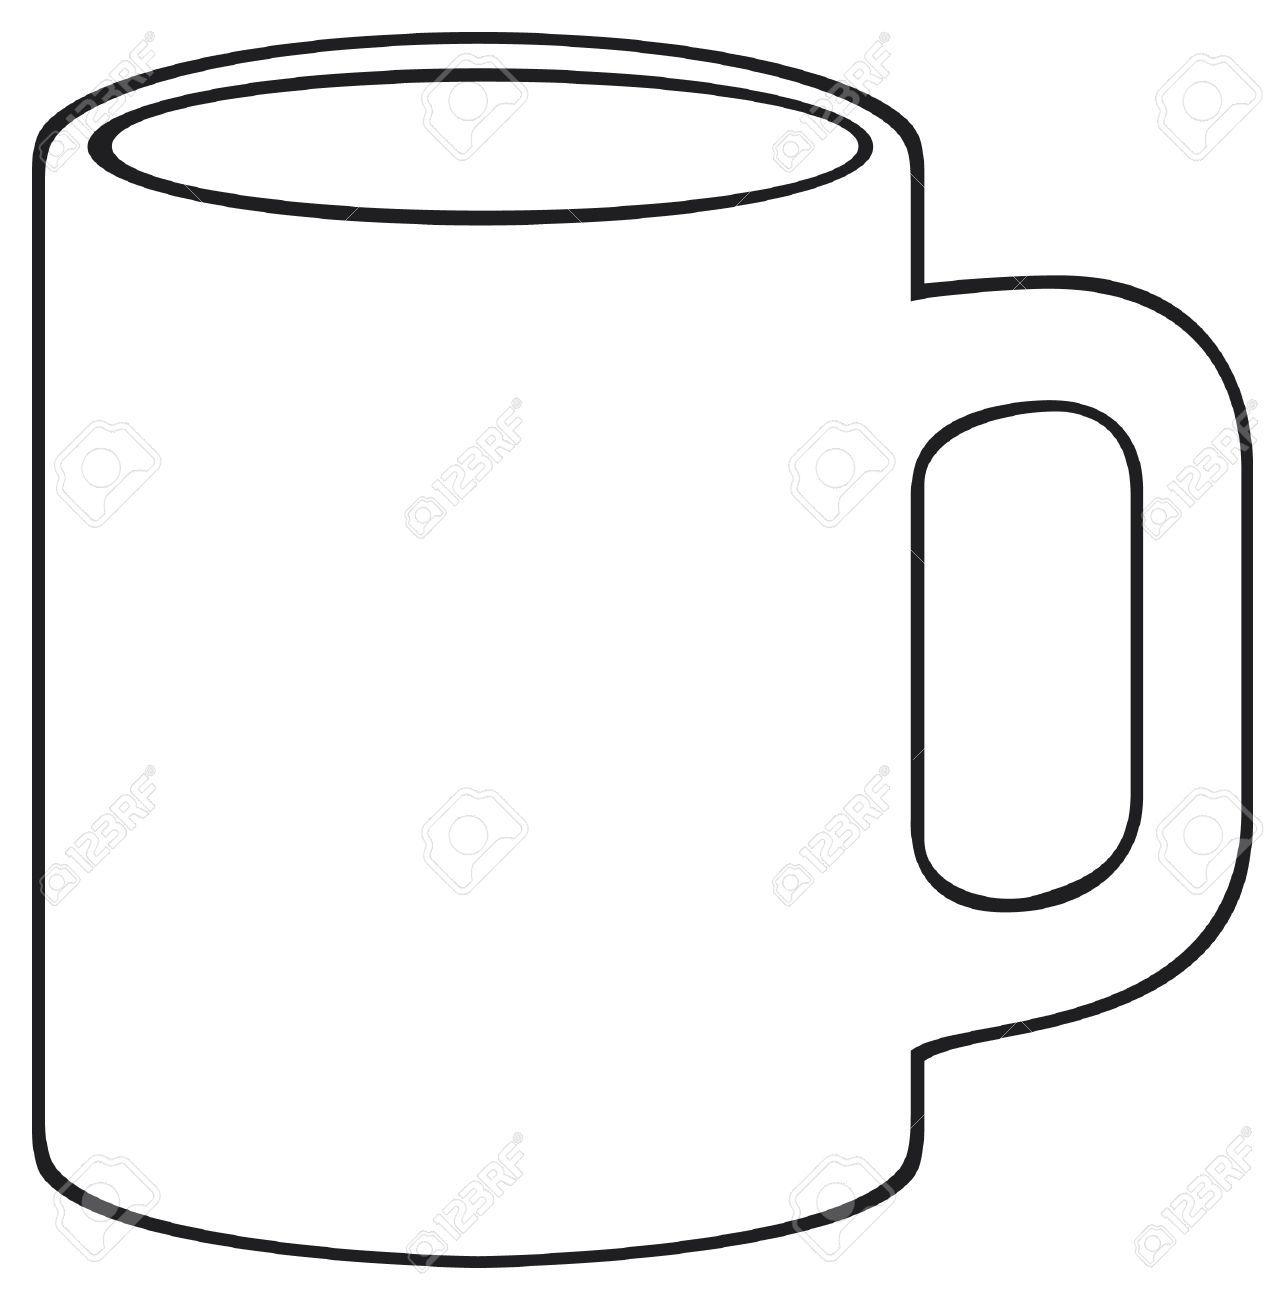 Coffee mug clipart free 6 » Clipart Portal.